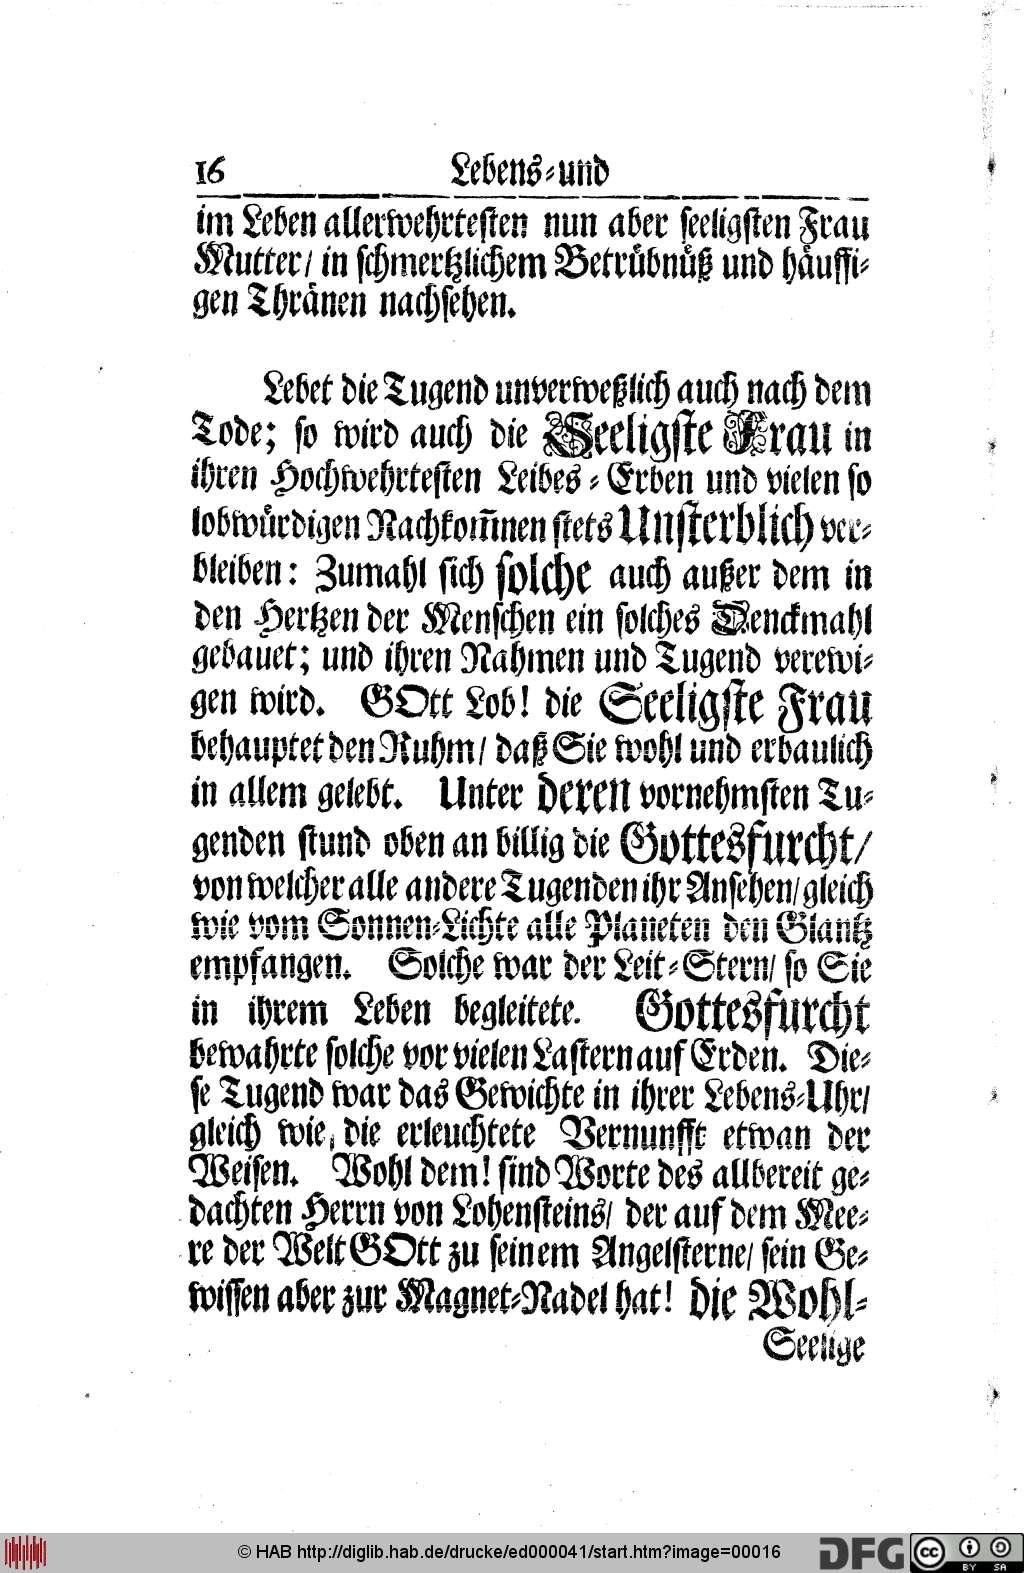 http://diglib.hab.de/drucke/ed000041/00016.jpg